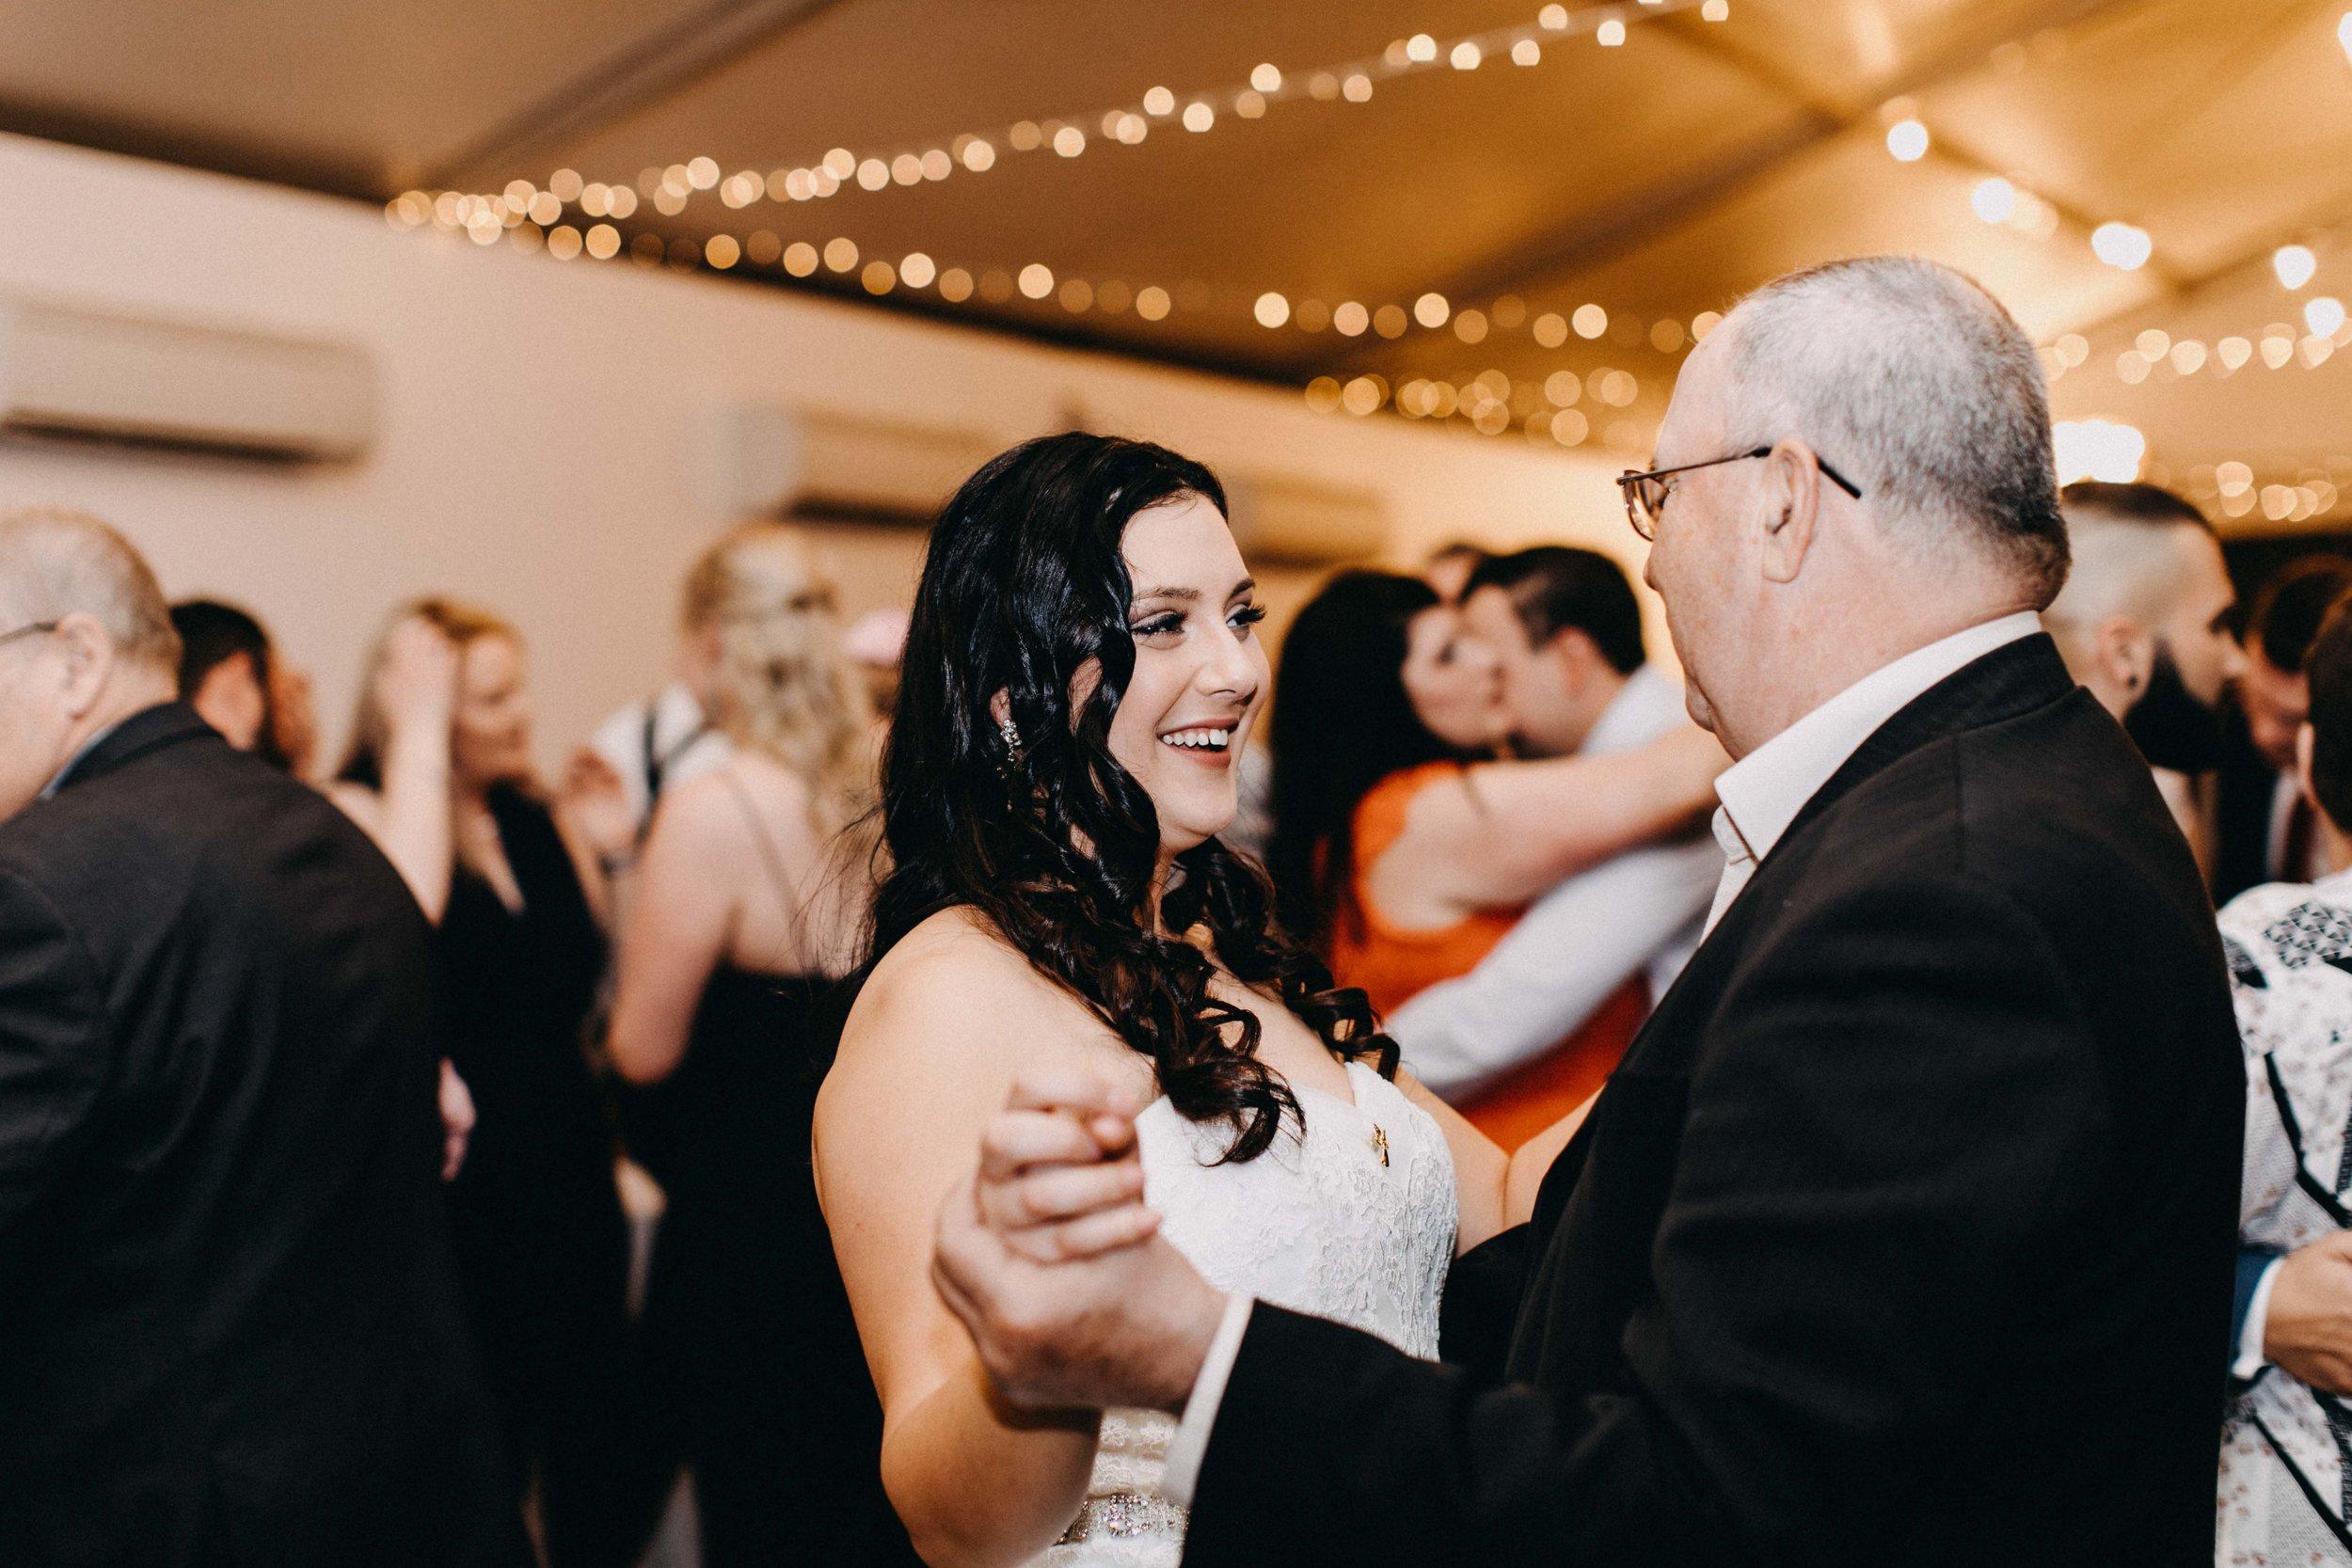 burnham-grove-camden-wedding-emilyobrienphotography-macarthur-177.jpg